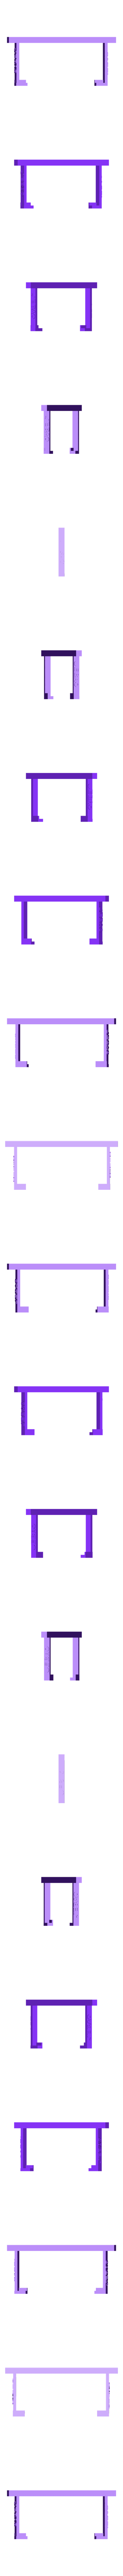 support droit pompe doseuse jebao.stl Download free STL file Jebao dosing pump support • 3D printable design, lorenzo61183